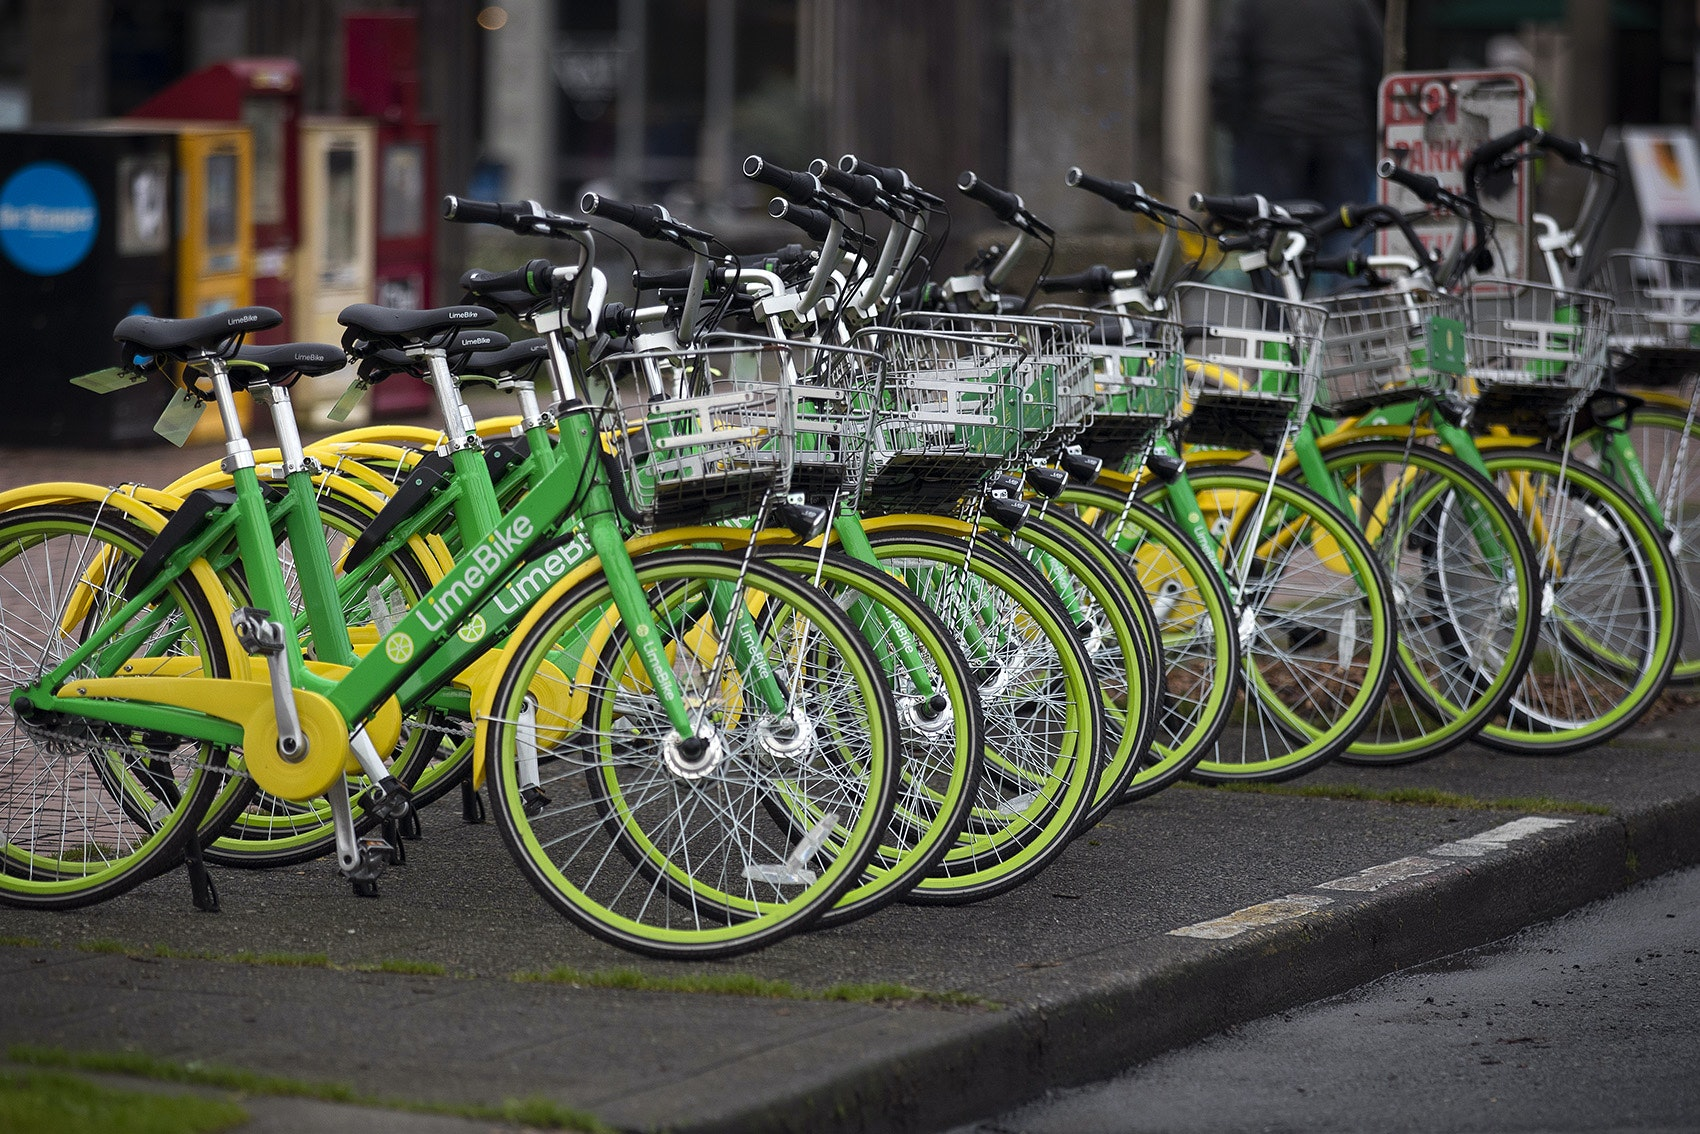 can share bikes make money